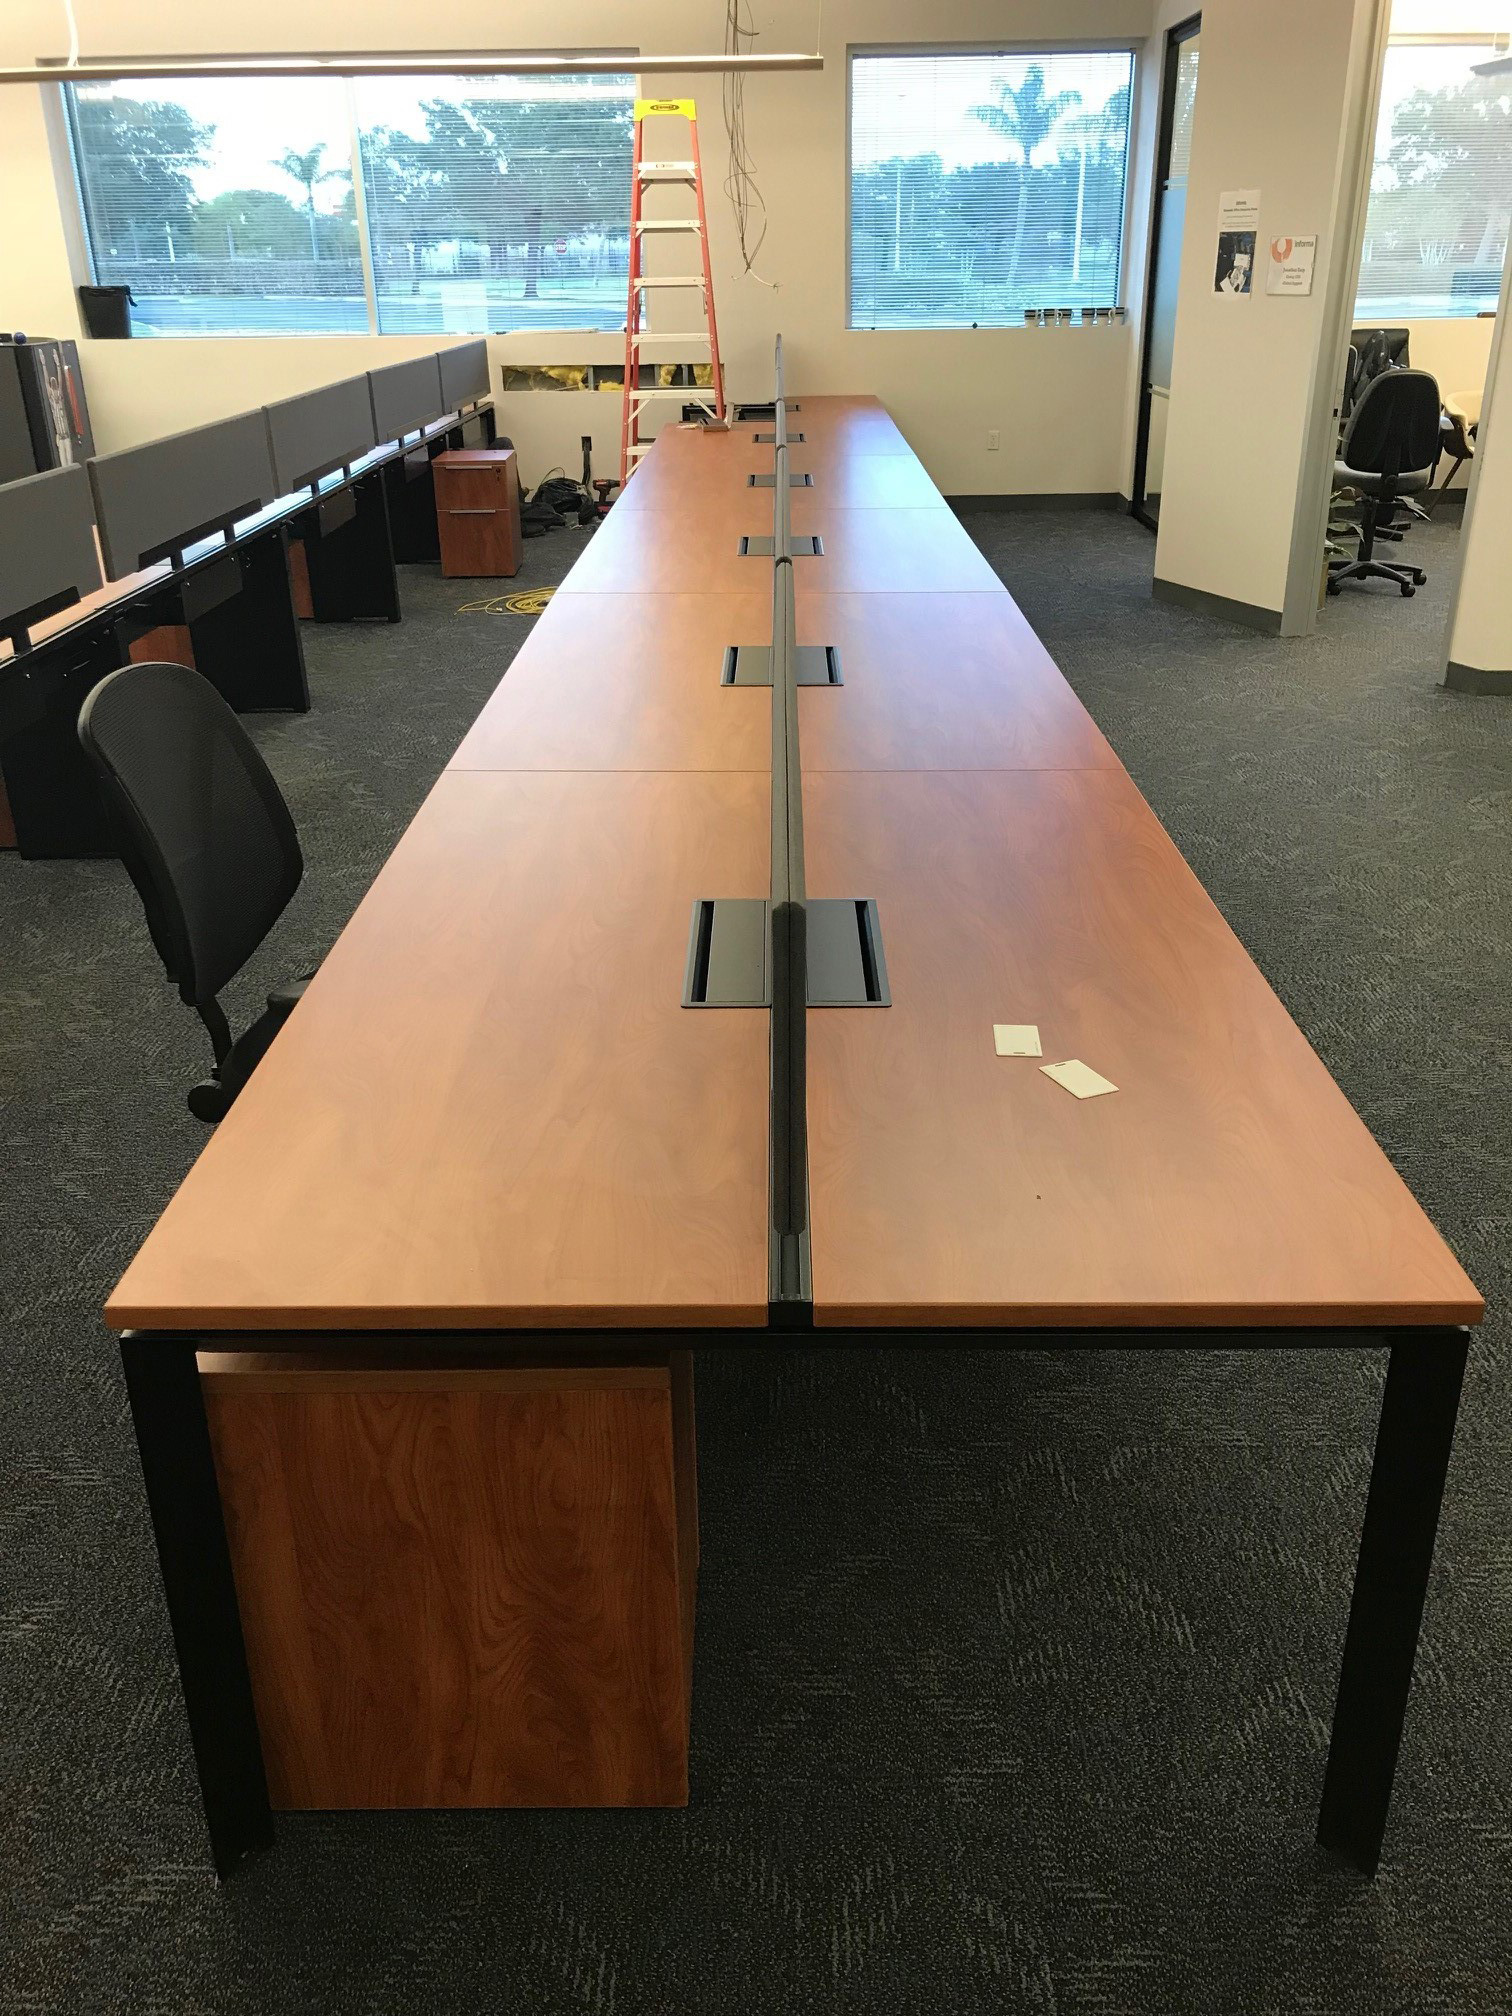 manasota-office-supplies-llc-8.jpg